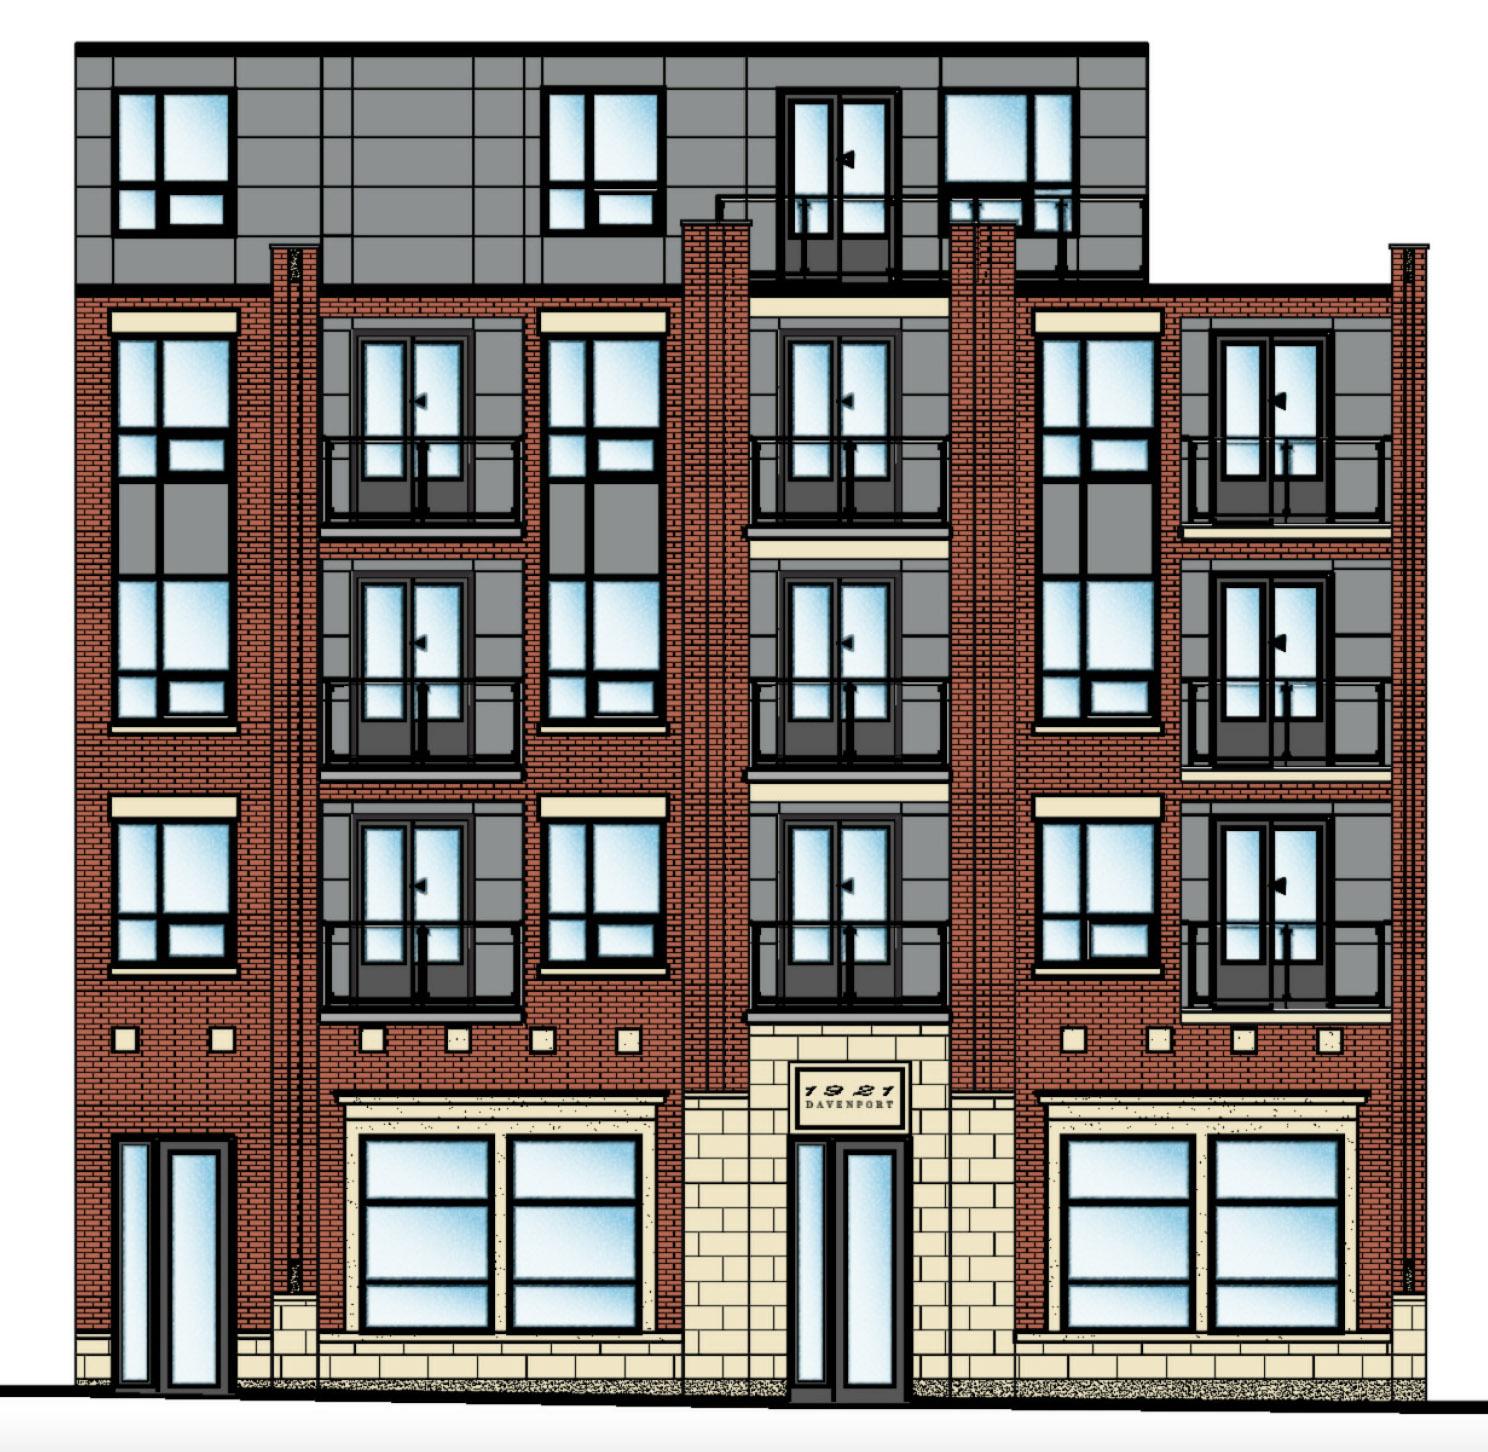 1921 Davenport Rd, Toronto, designed by Ambient Designs Ltd.